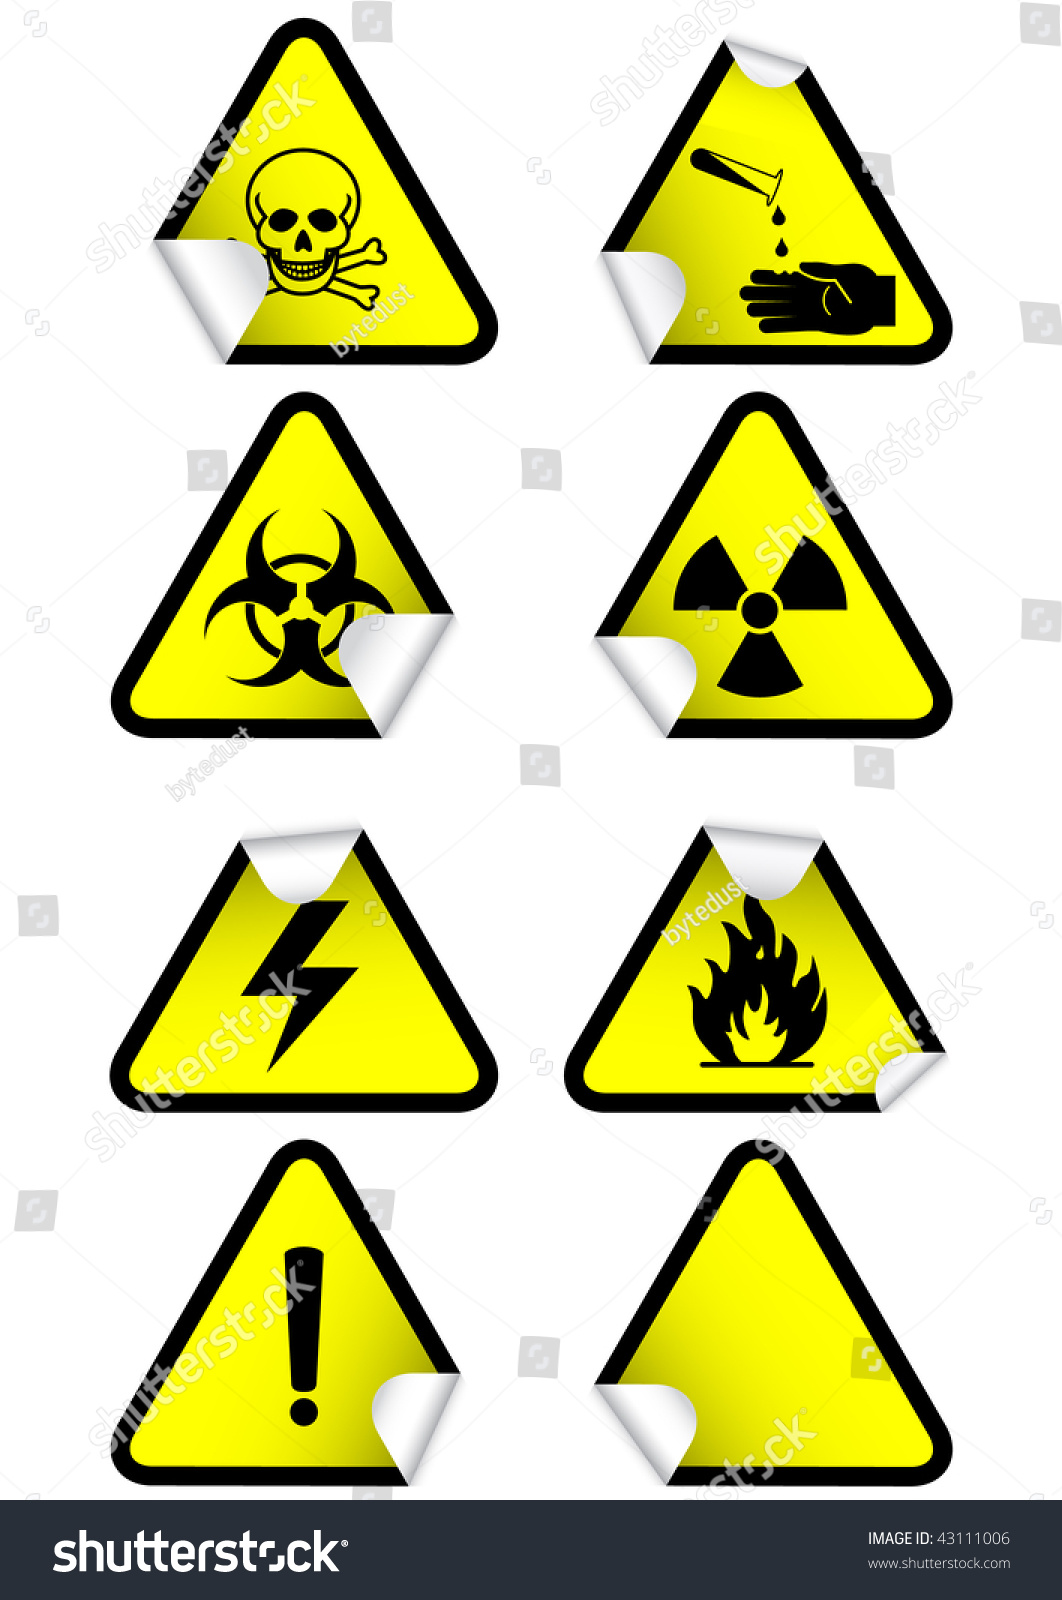 Vector illustration set different hazmat warning stock vector vector illustration set of different hazmat warning signs all vector objects and details are isolated biocorpaavc Choice Image